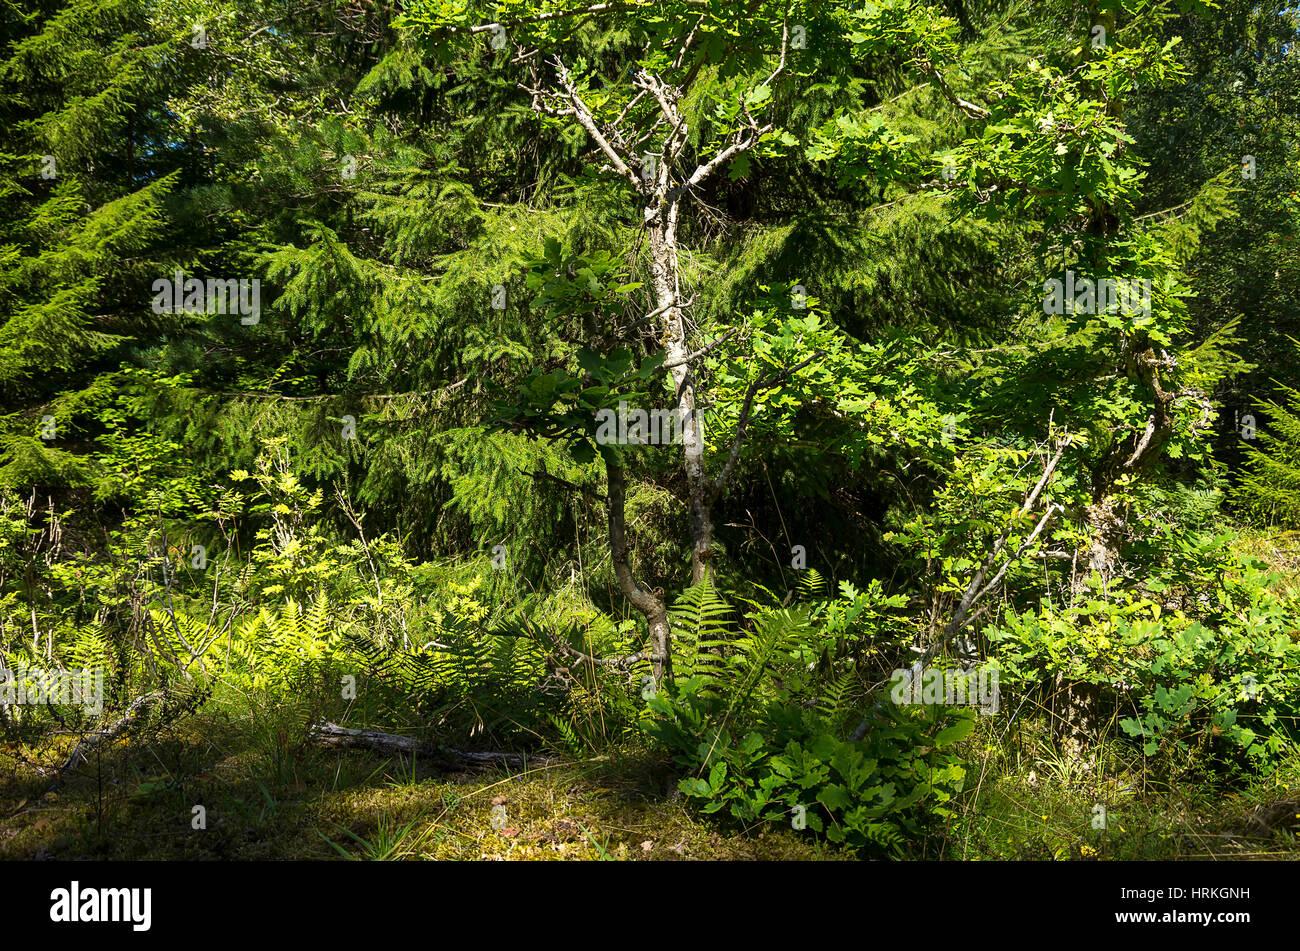 Kleinen Wald Stück mit Unterholz. Stockbild